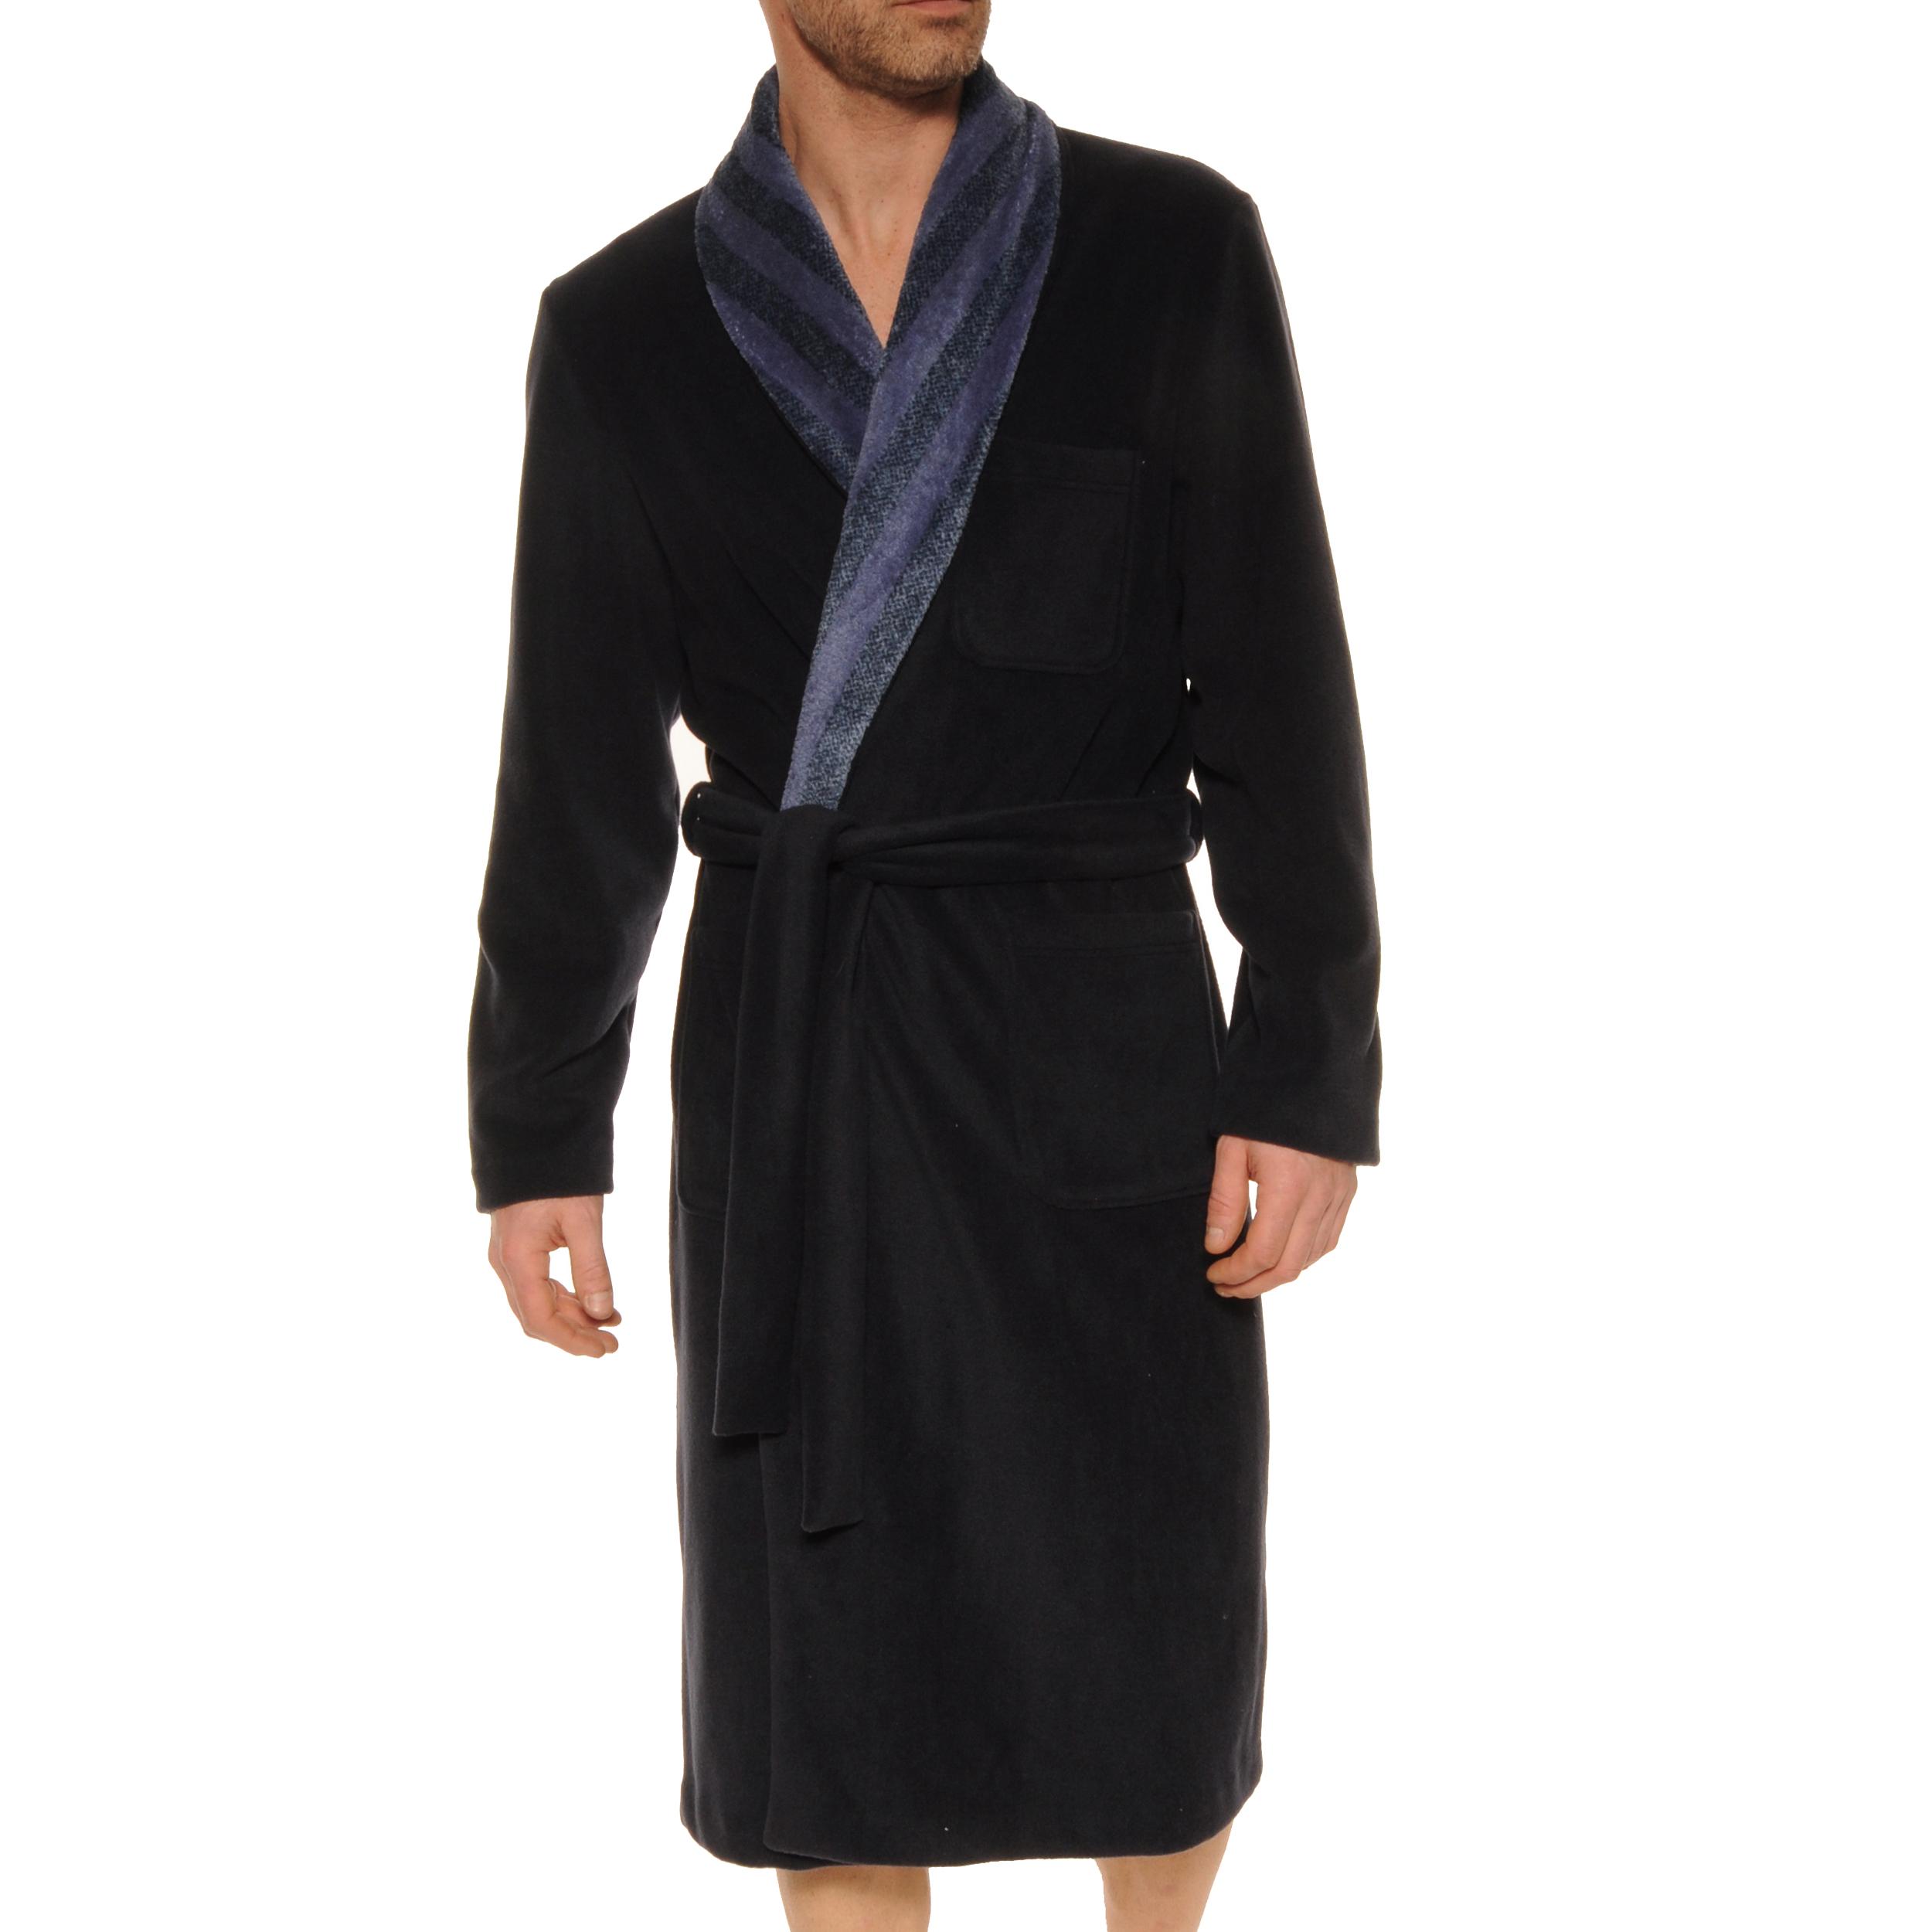 Robe de chambre Christian Cane Kristian en velours bleu marine à col châle bleu indigo à rayures